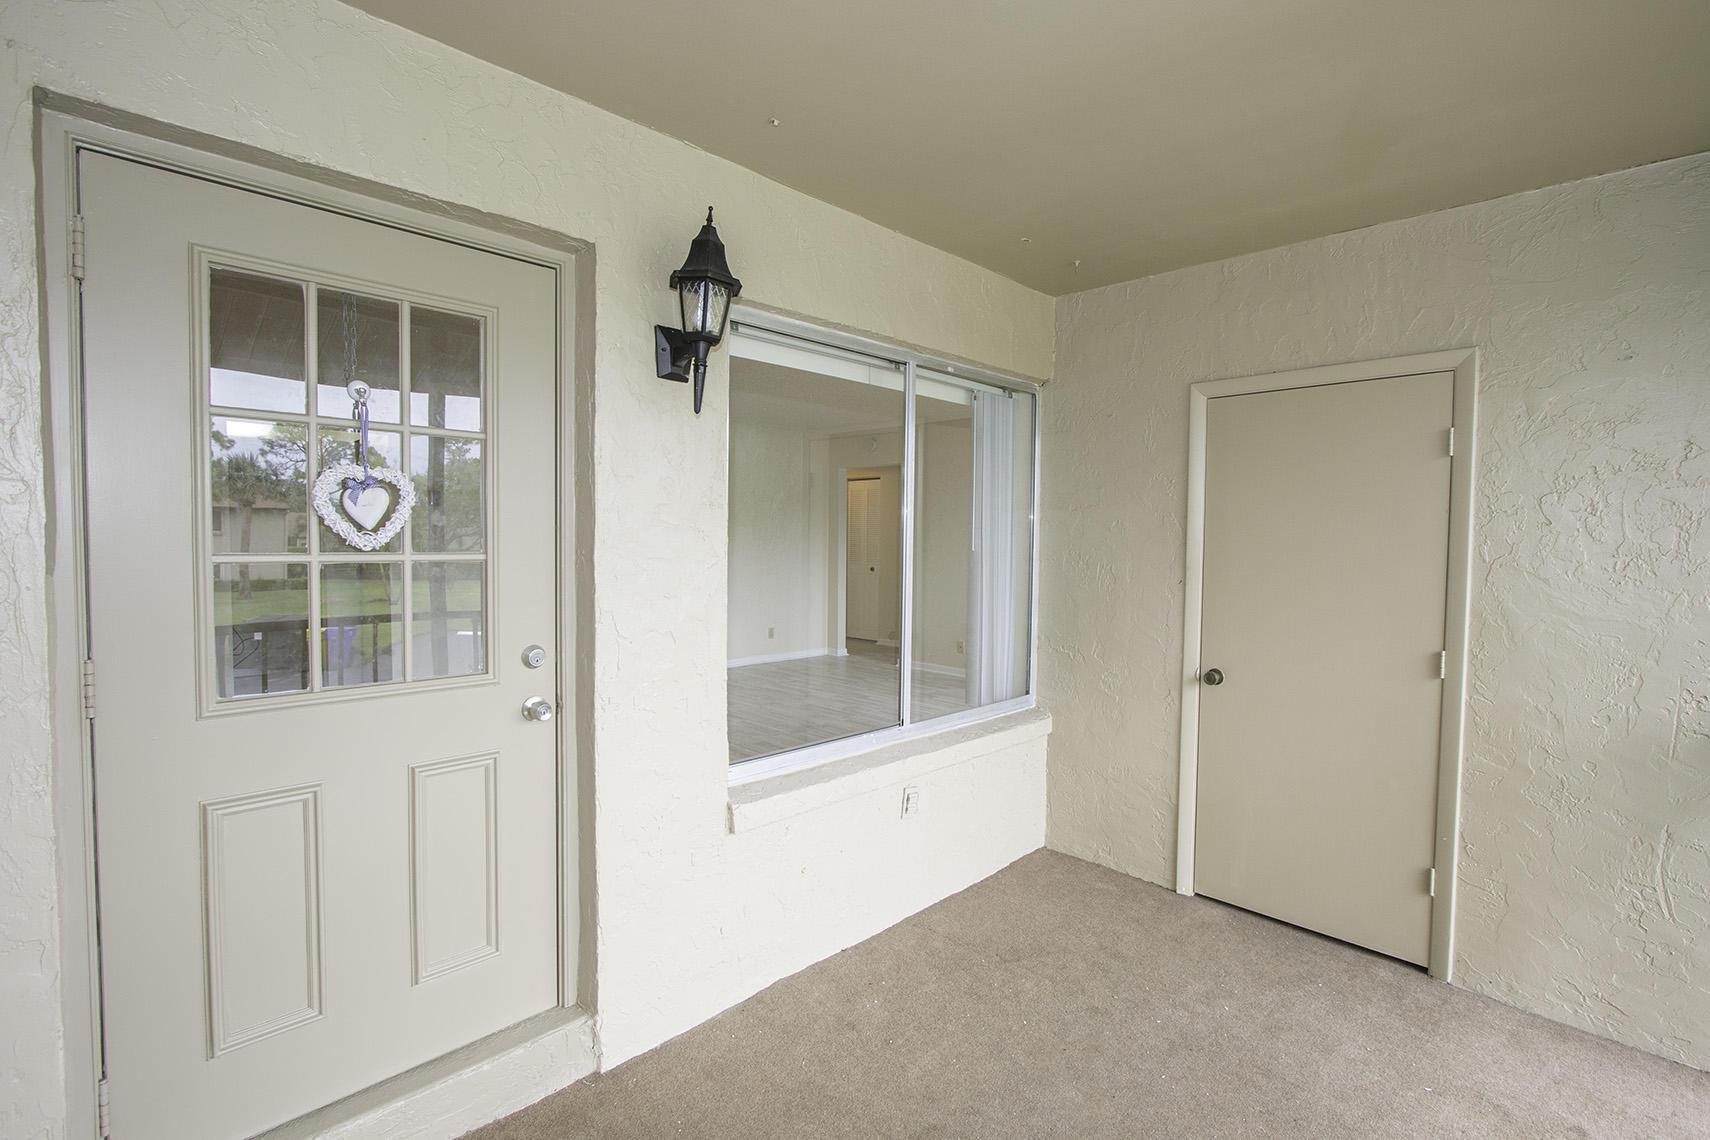 501 Shady Pine Way, Greenacres, FL 33415